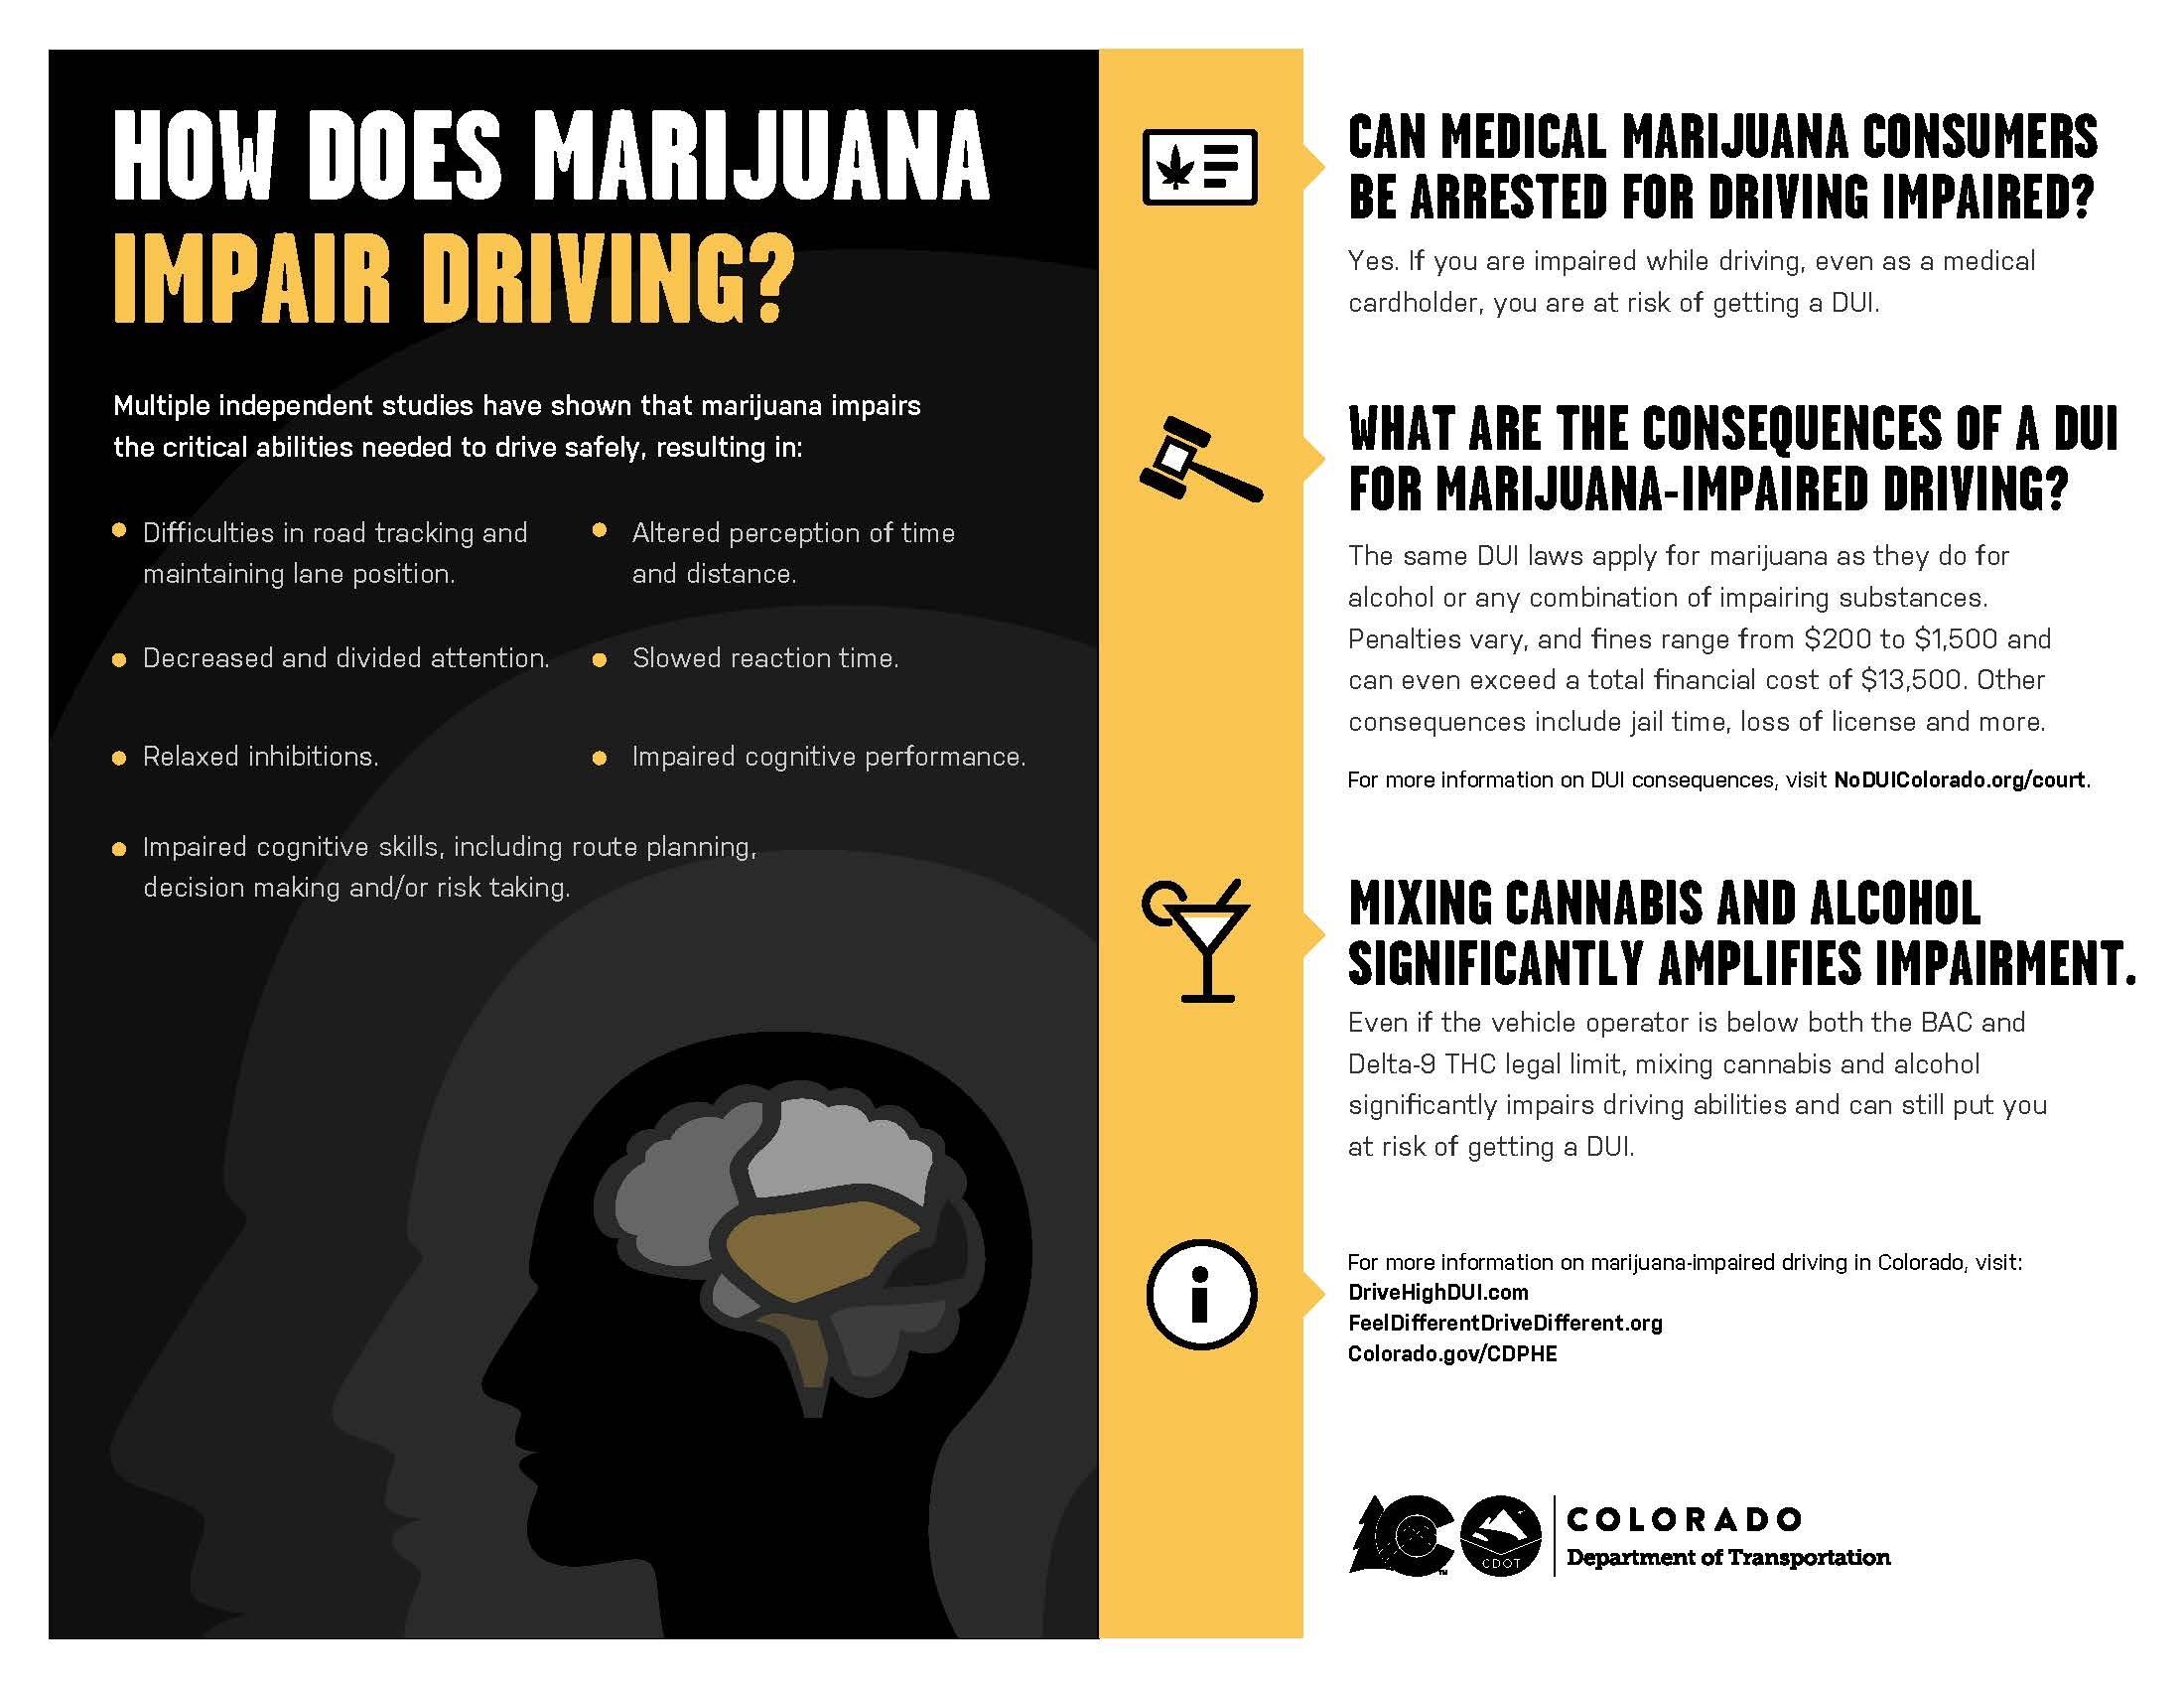 Marijuana, cannabis, marijuana-impaired driving, driving high, drunk driving, DUI, marijuana DUI, CDOT, Colorado Department of Transportation, transportation, safety